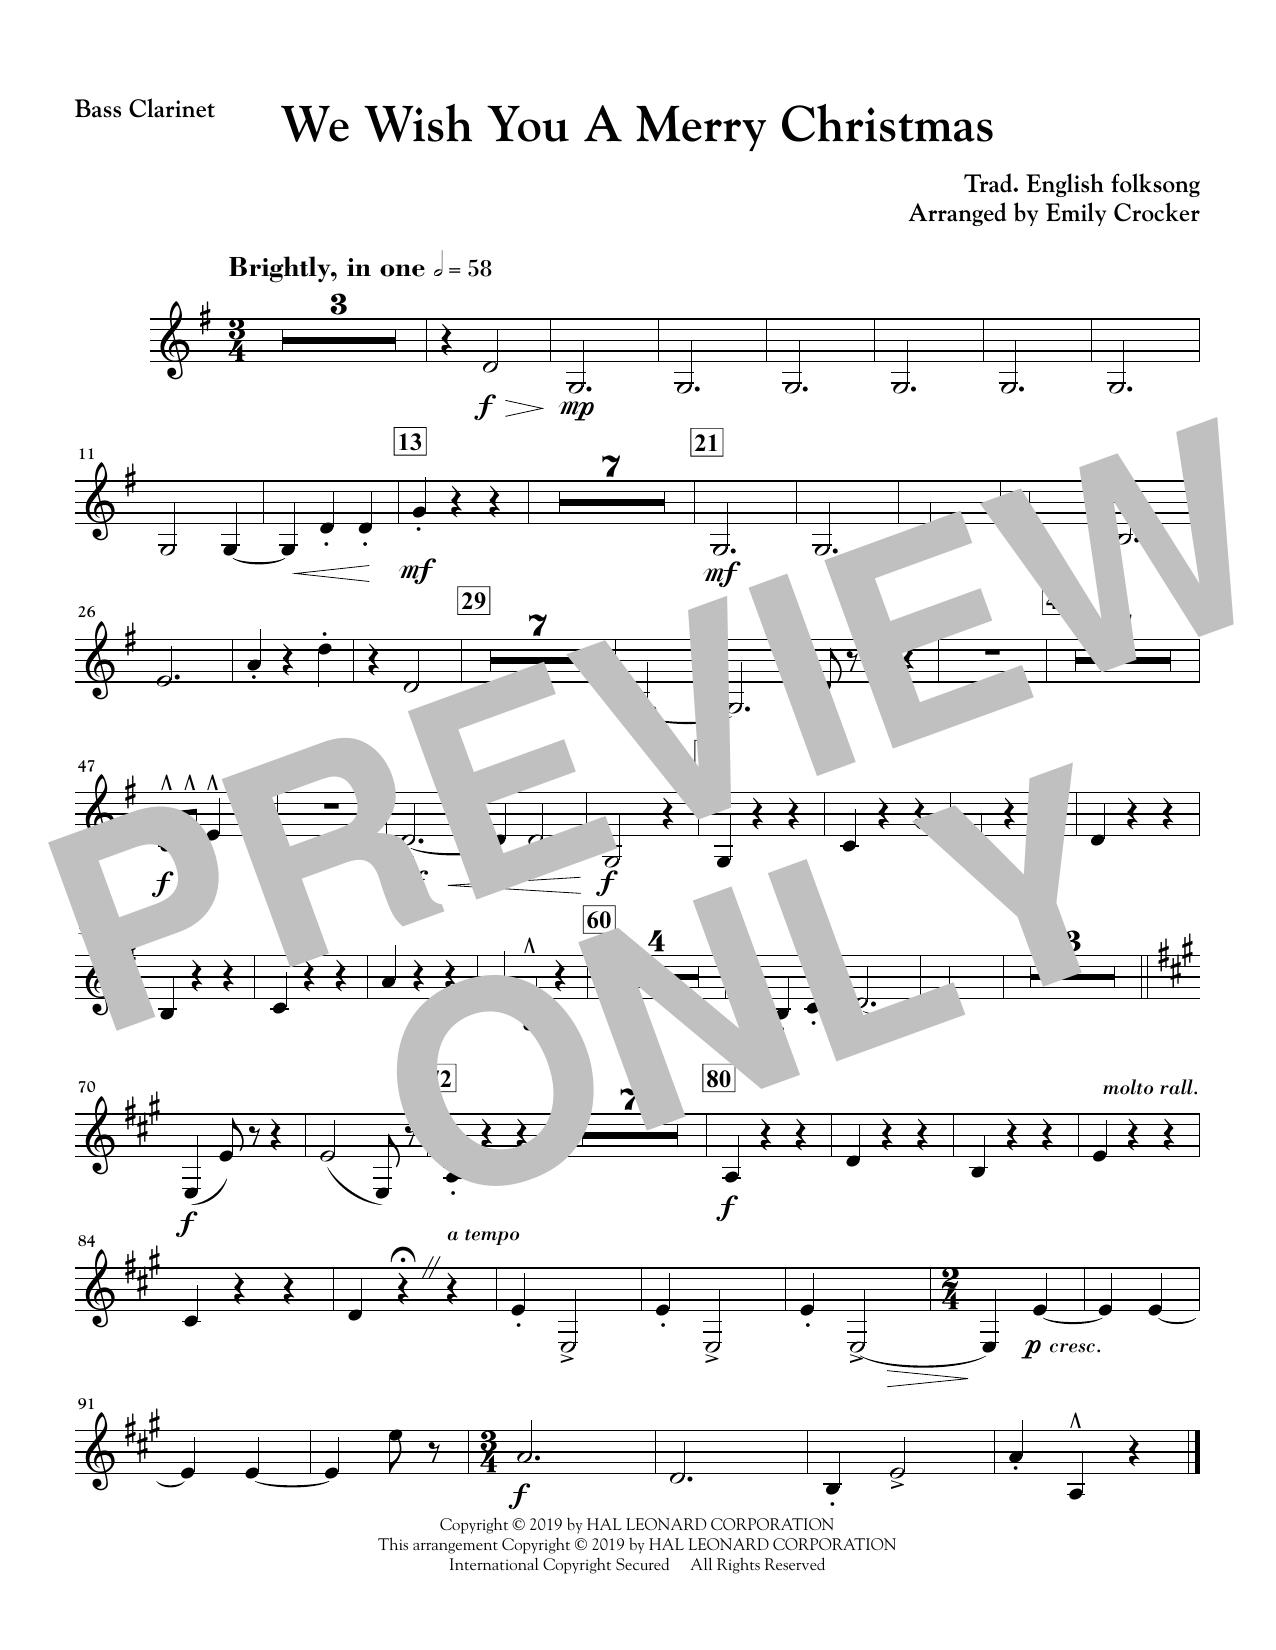 We Wish You a Merry Christmas - Bass Clarinet Sheet Music